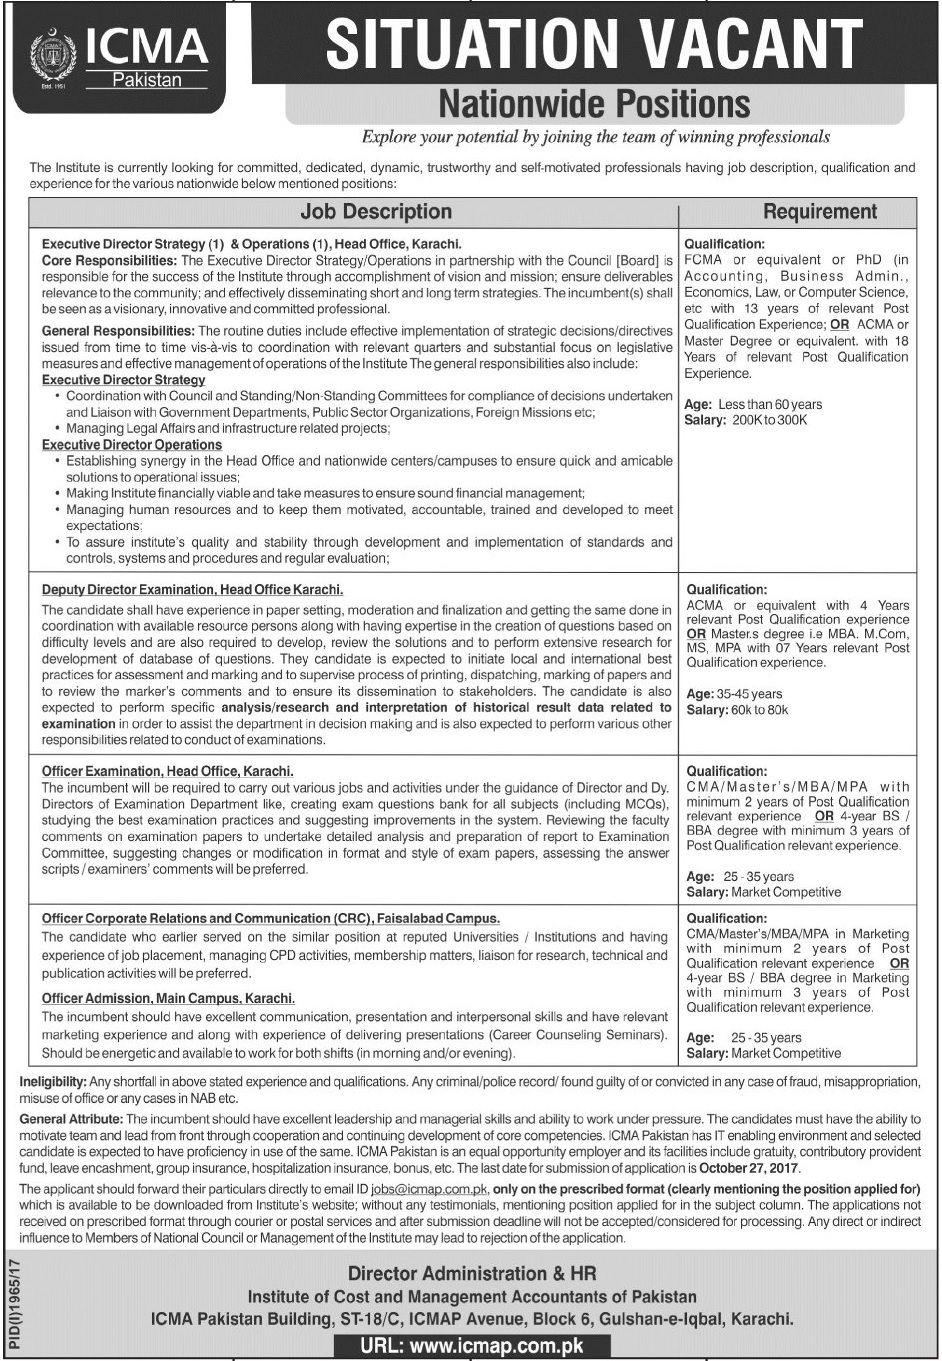 Icma Pakistan Jobs  In Karachi And Faisalabad For Deputy